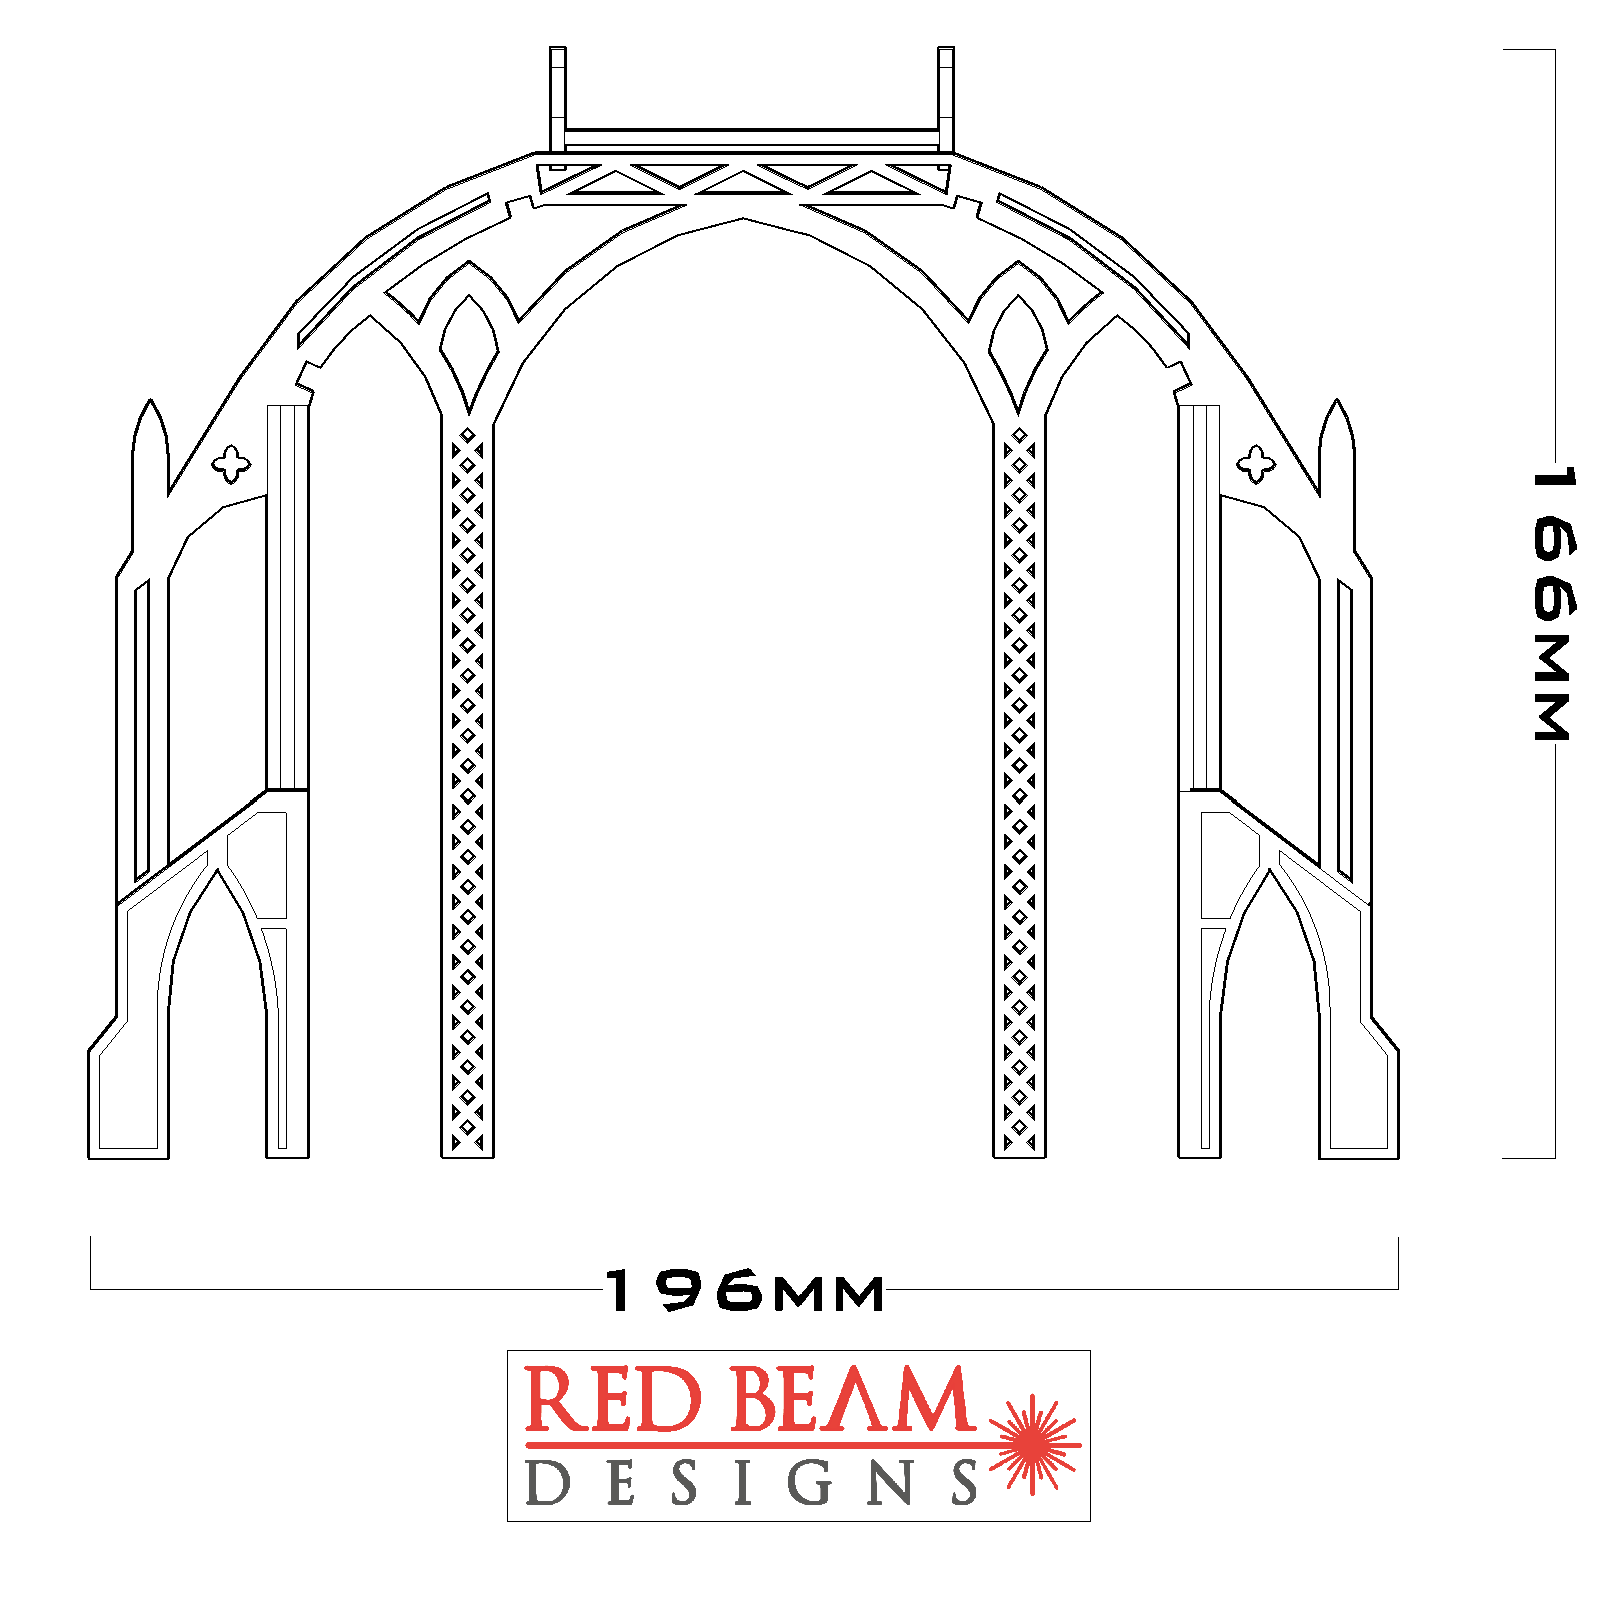 RBD081001_RENDER002.png